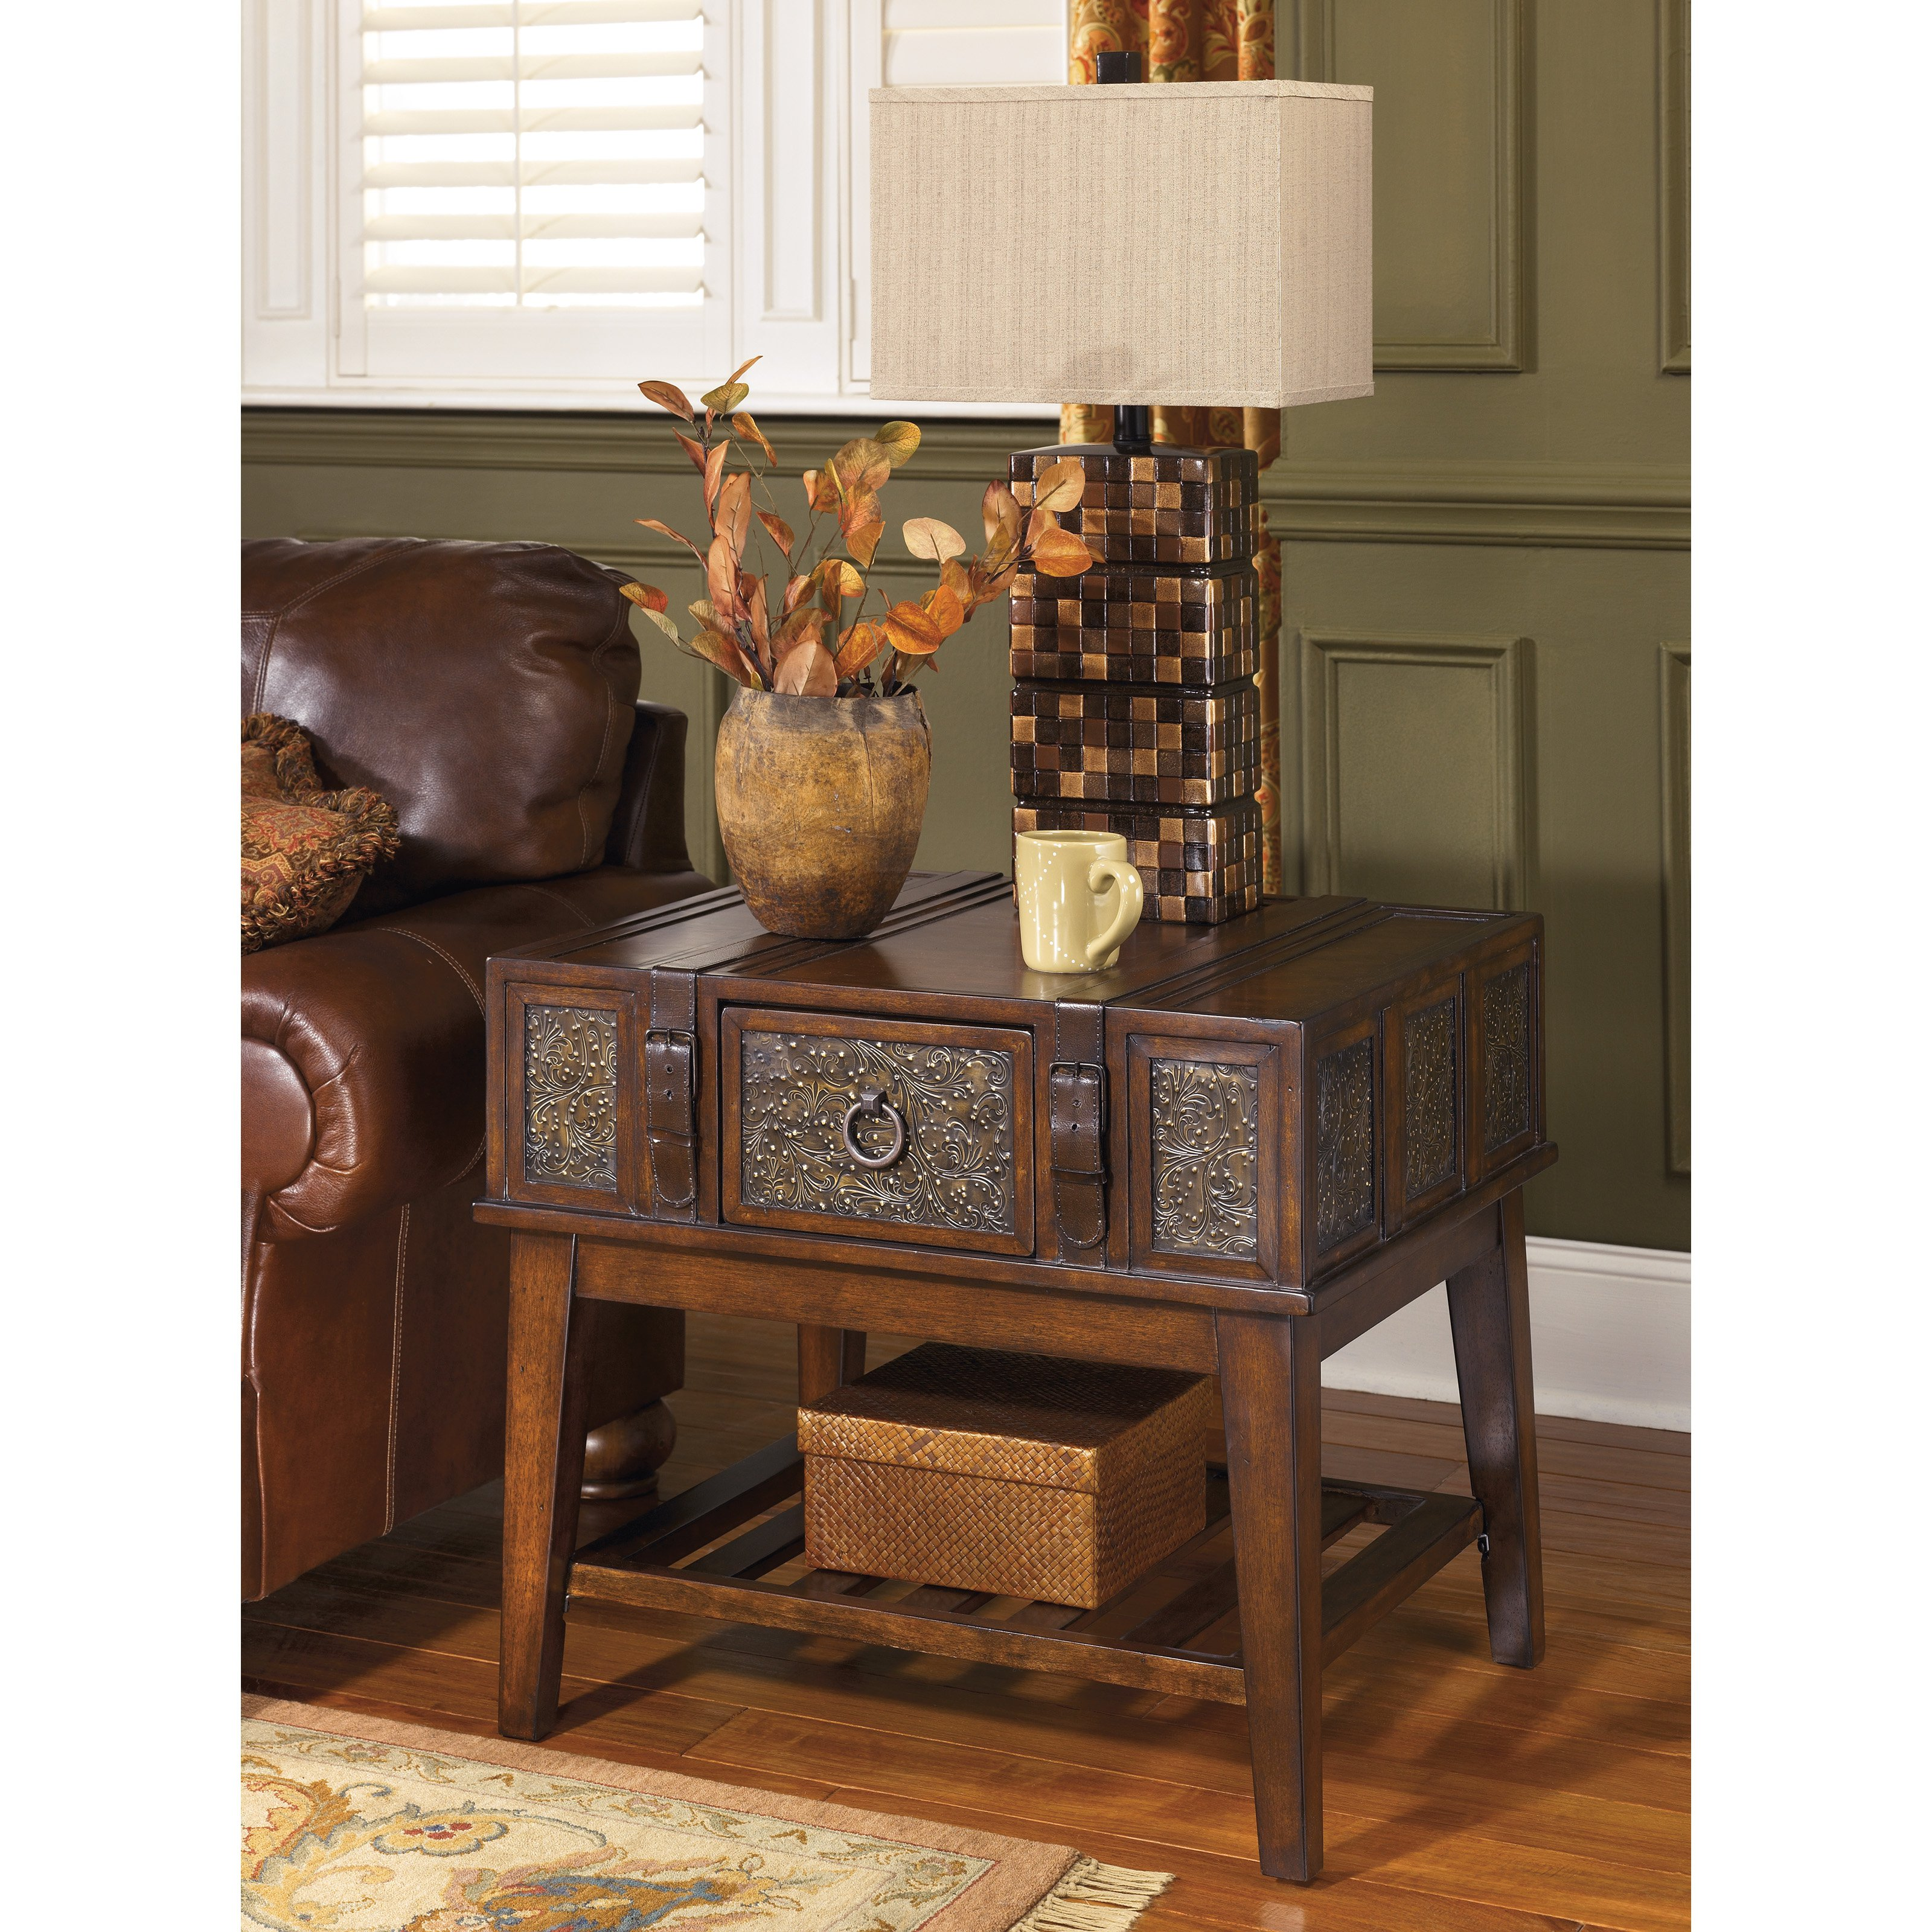 Ashley Furniture Signature Design T7533 McKenna End Table